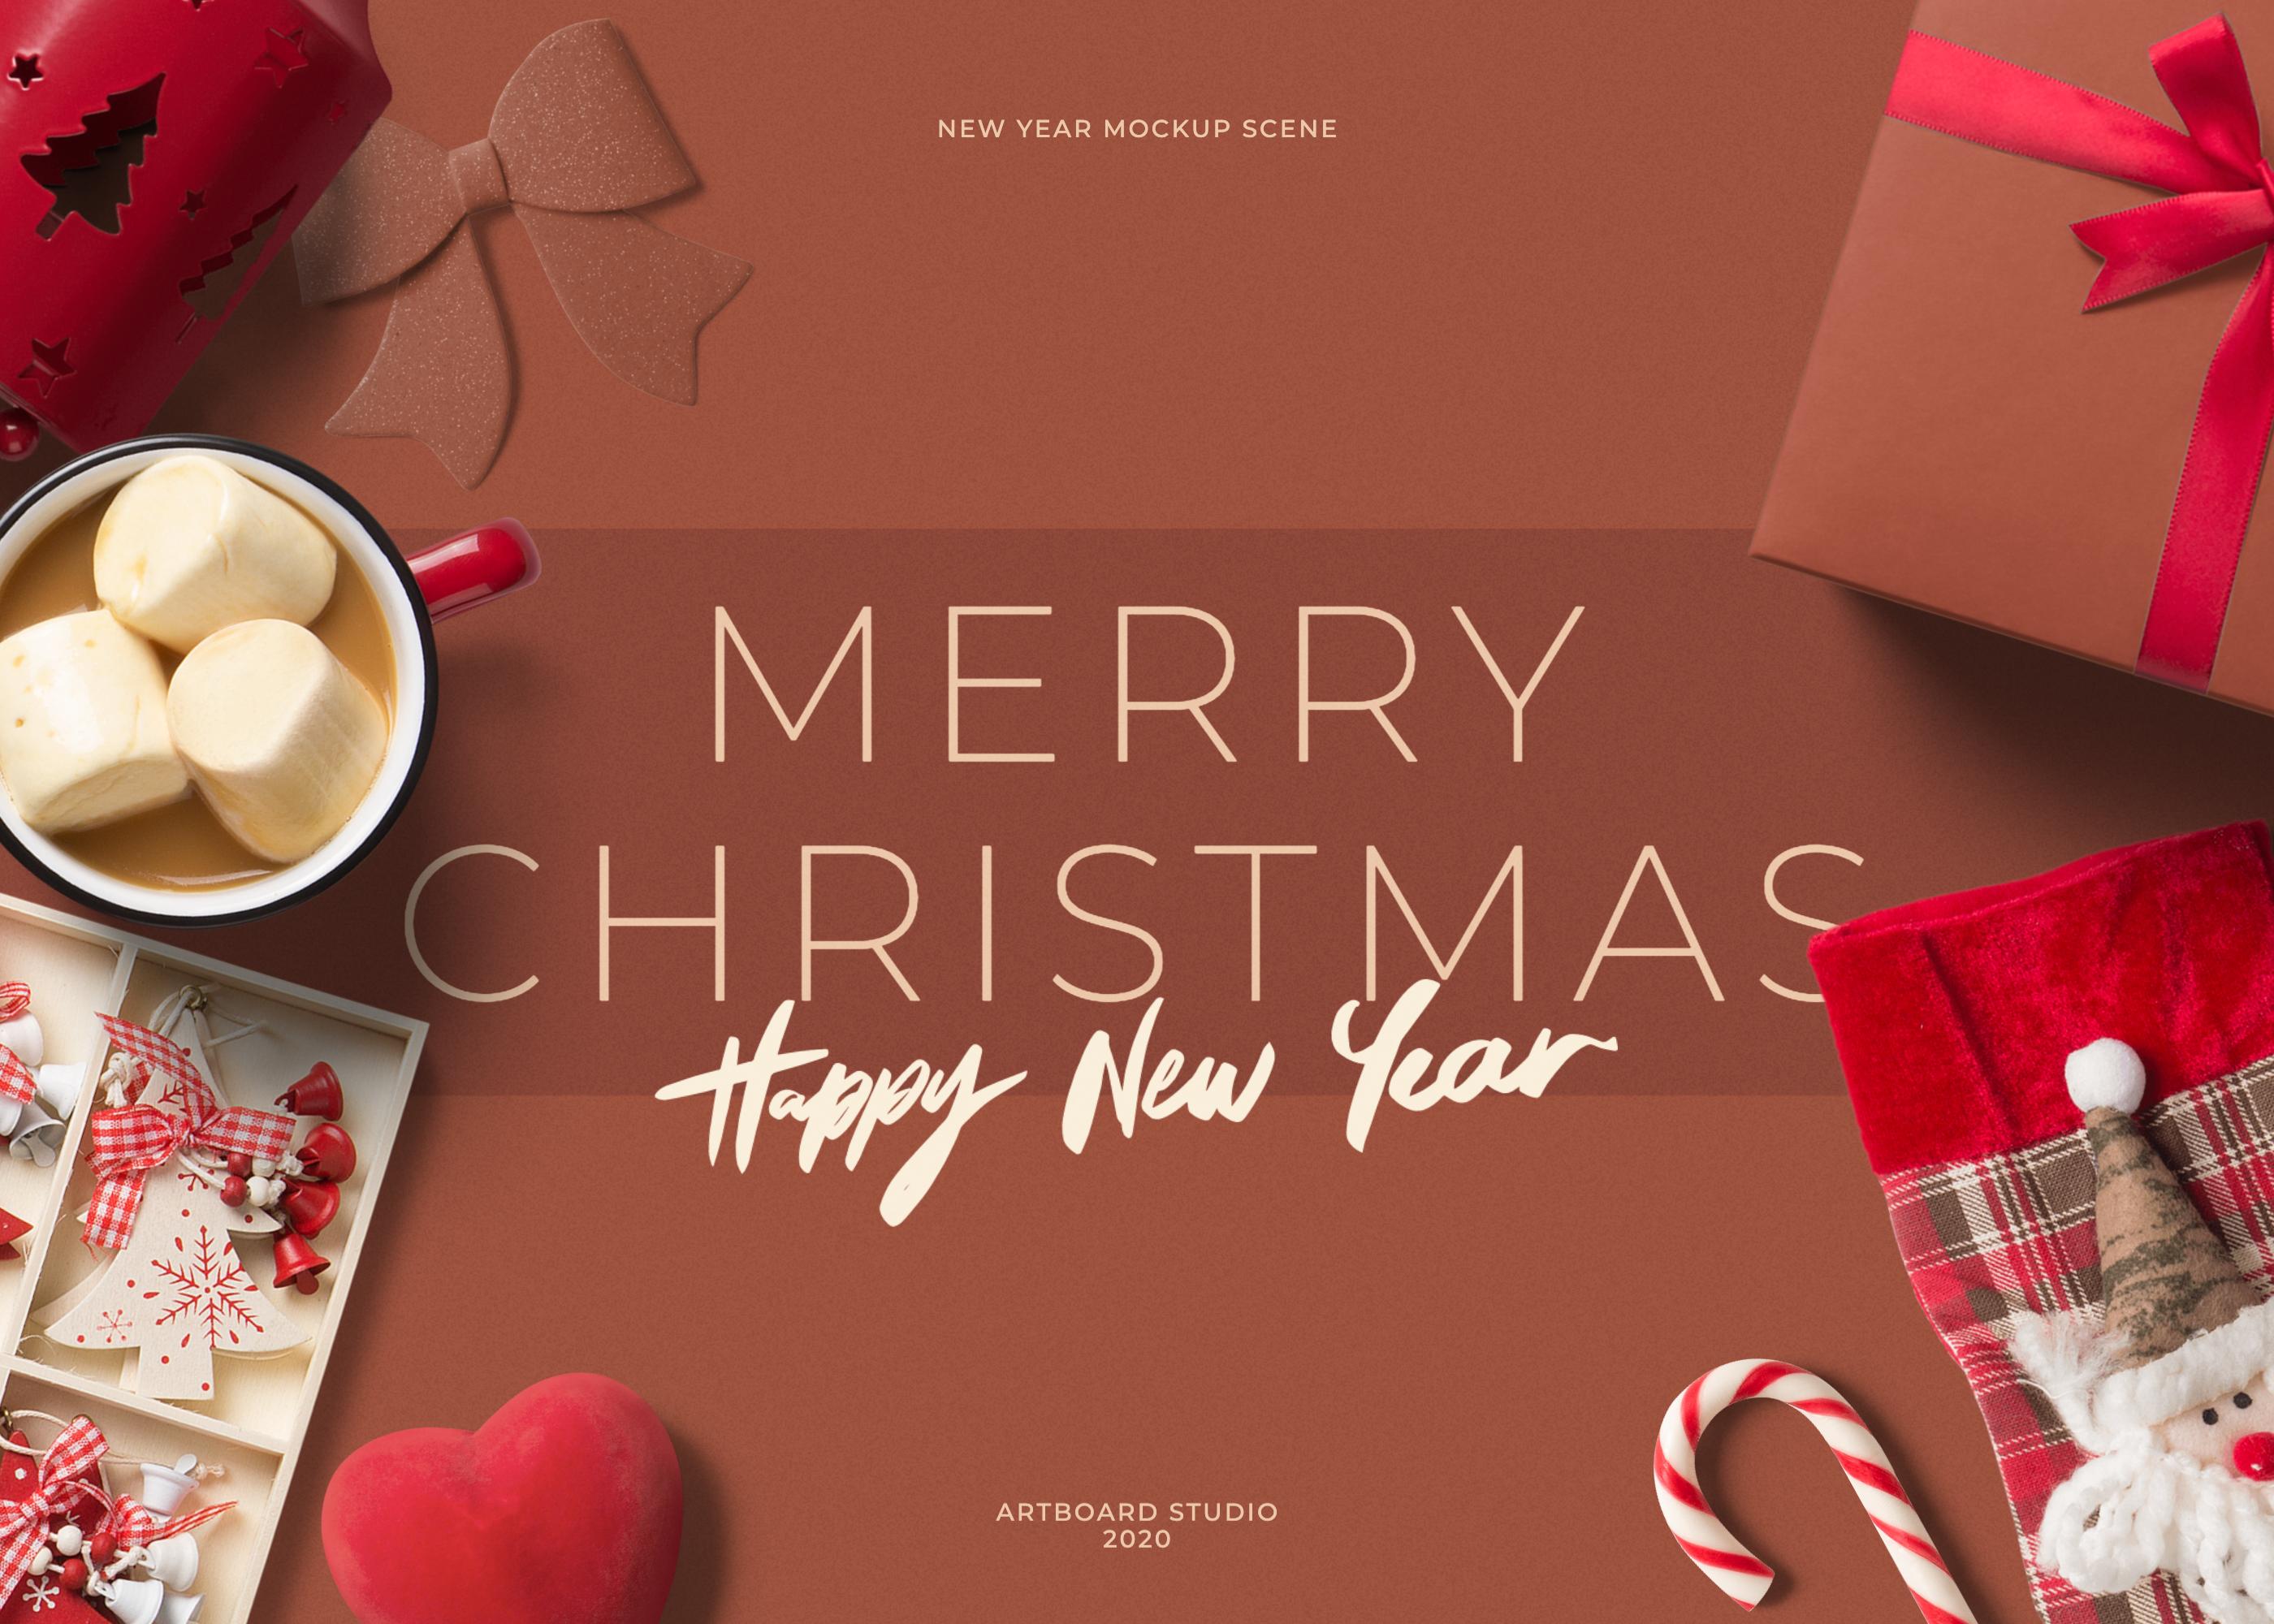 Create Mockups Online Artboard Studio New Year Mockup Scene